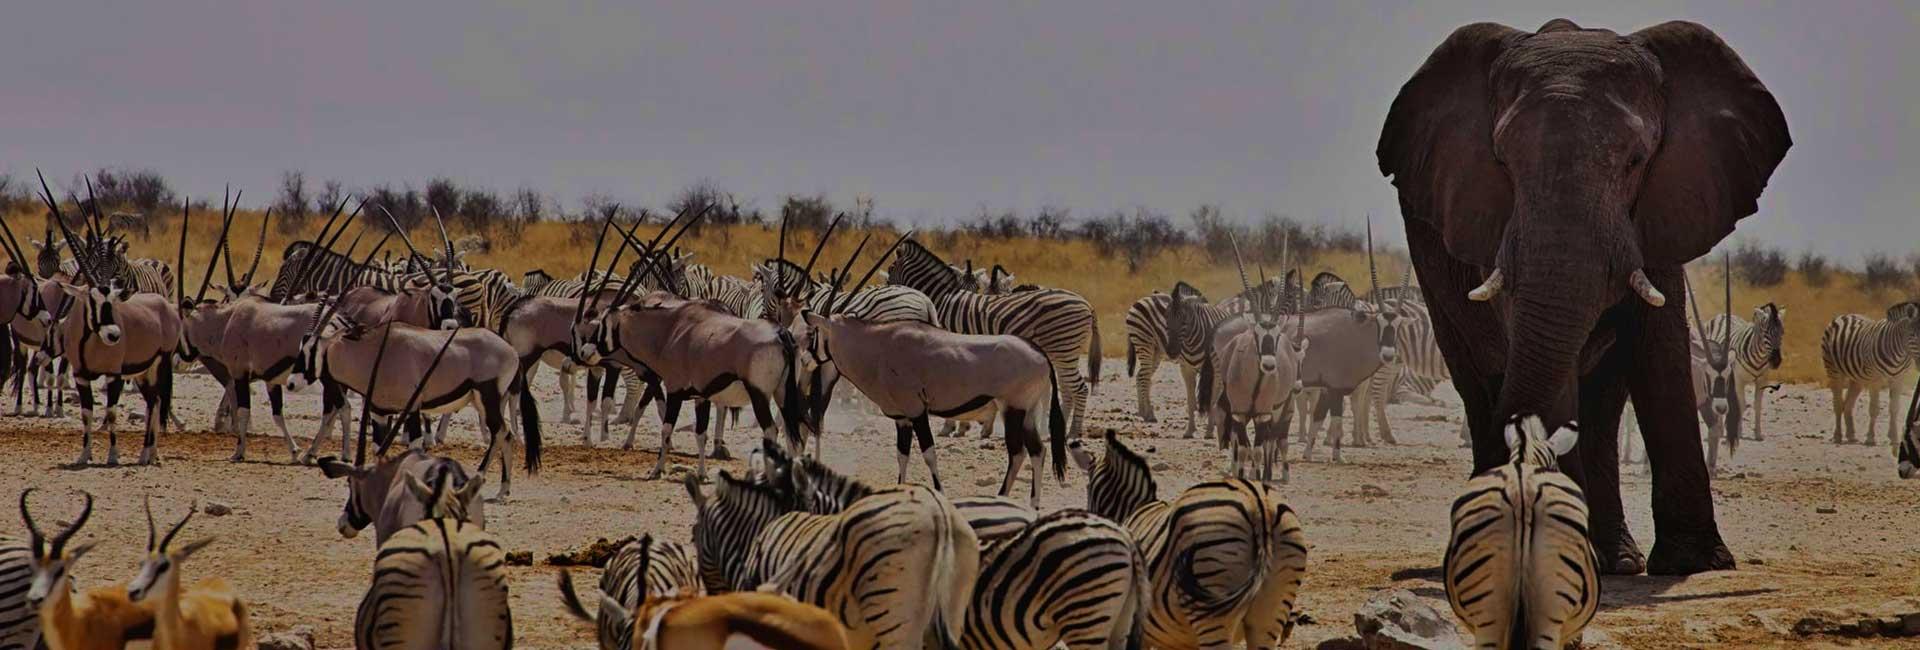 Namibia Accommodated Safari